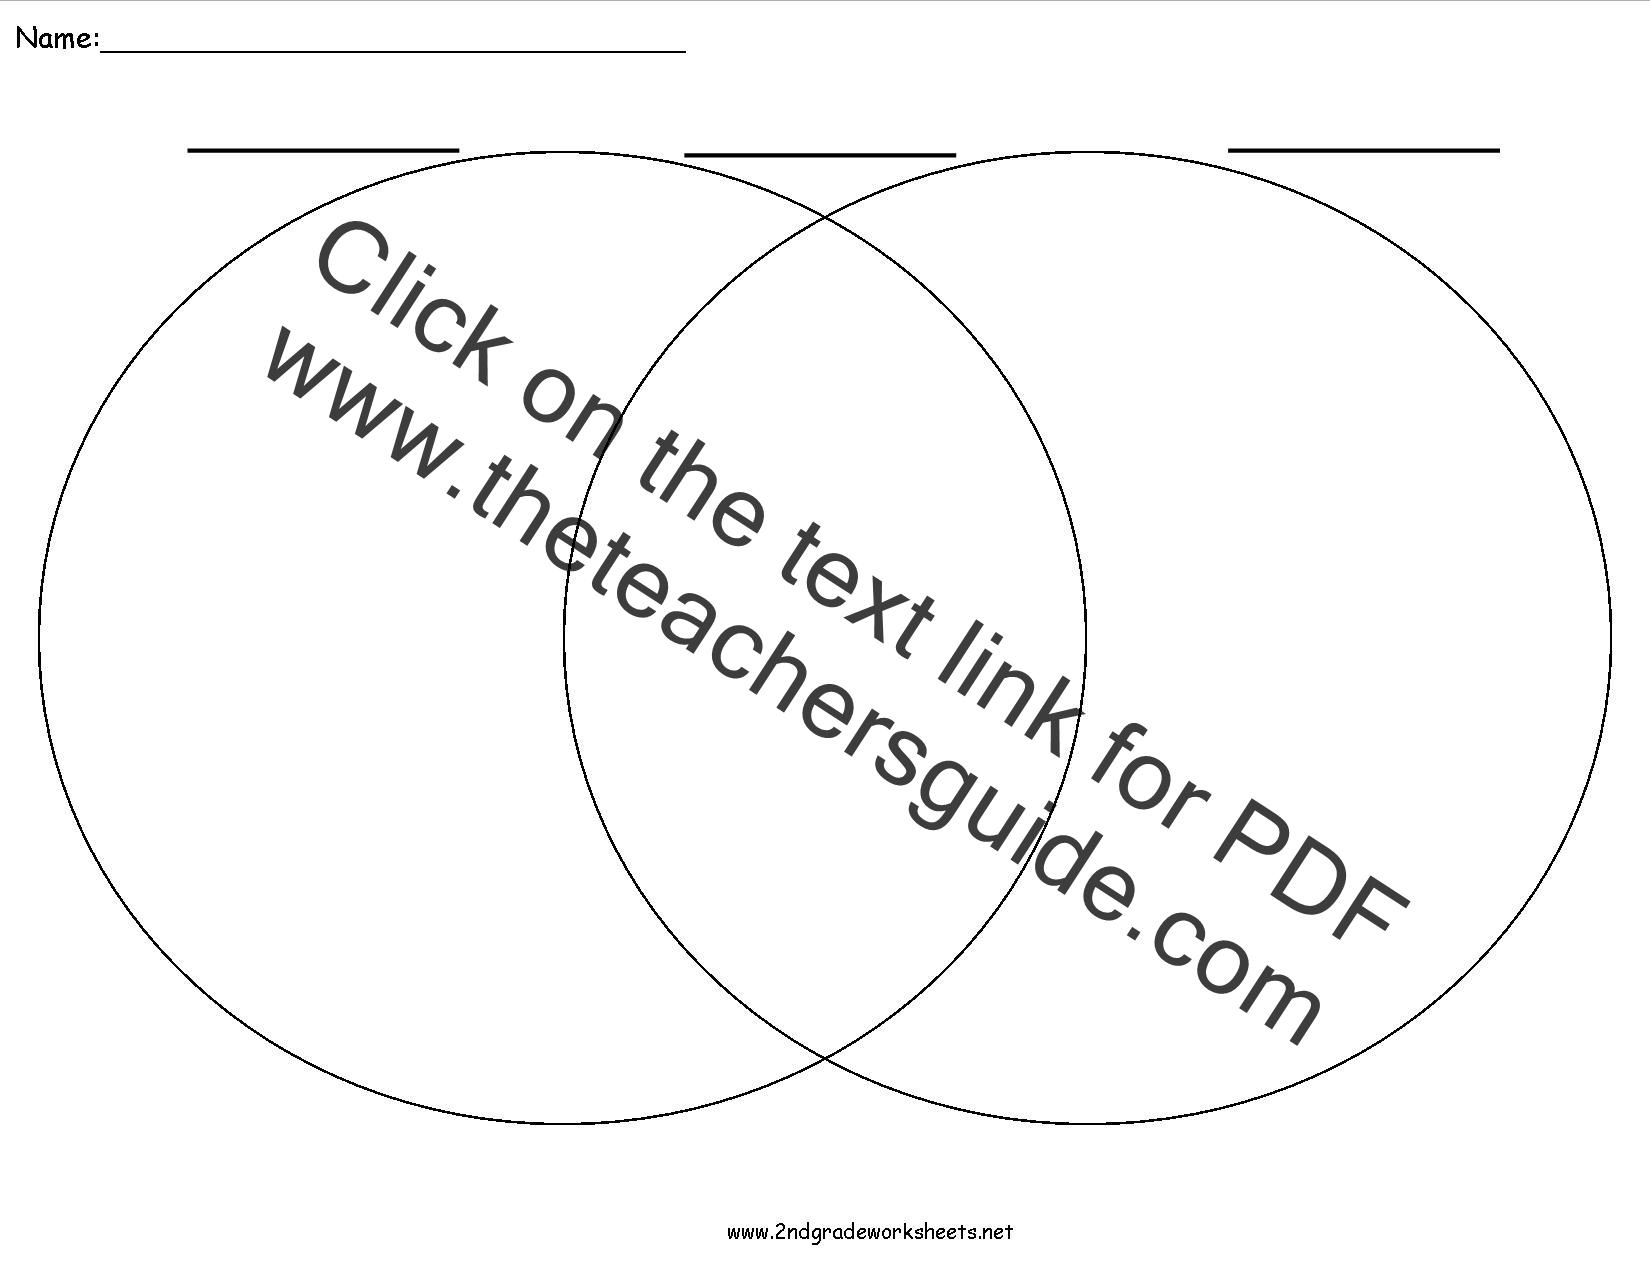 christianity judaism islam venn diagram ceiling light wiring uk compare and contrast essay